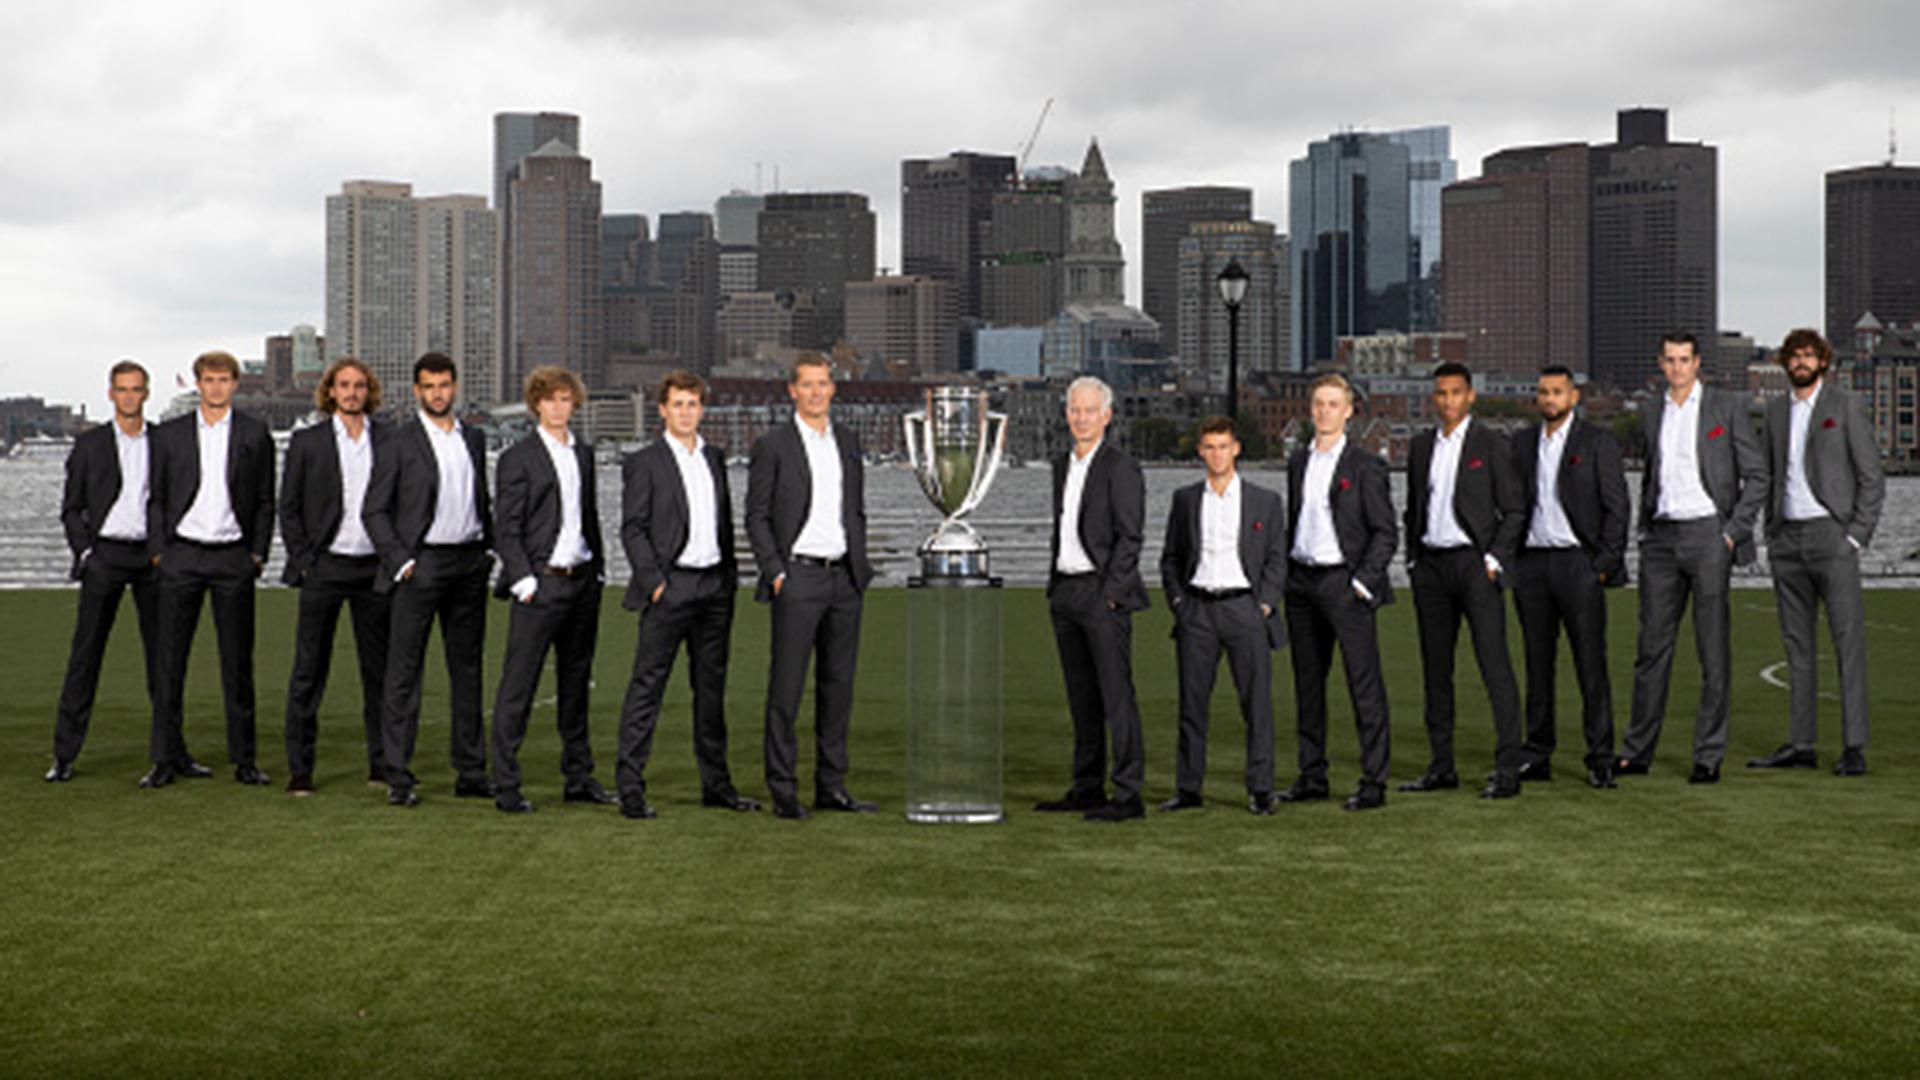 Can Shapo, Felix help Team World finally beat Team Europe at 2021 Laver Cup? - TSN